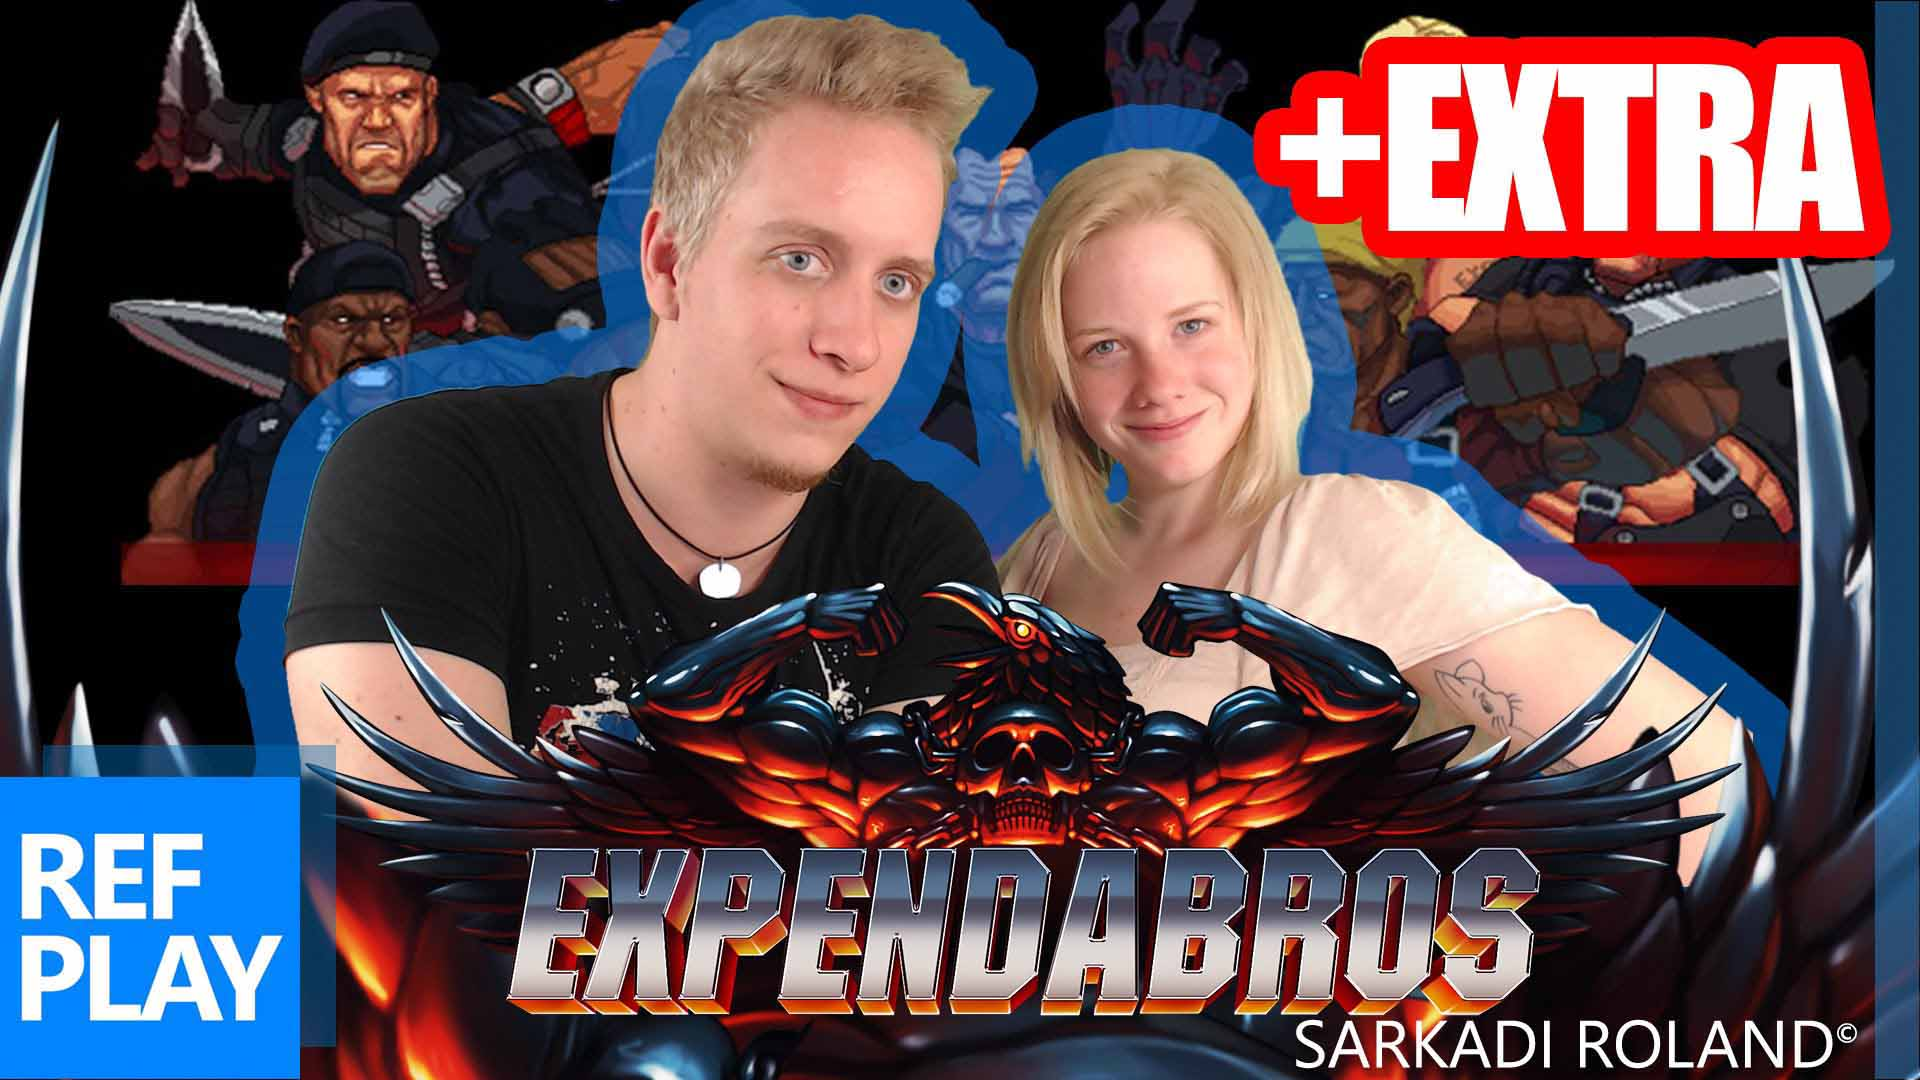 MEGLEPTÉS  VENDÉG!!! | The Expendabros | Magyar gameplay